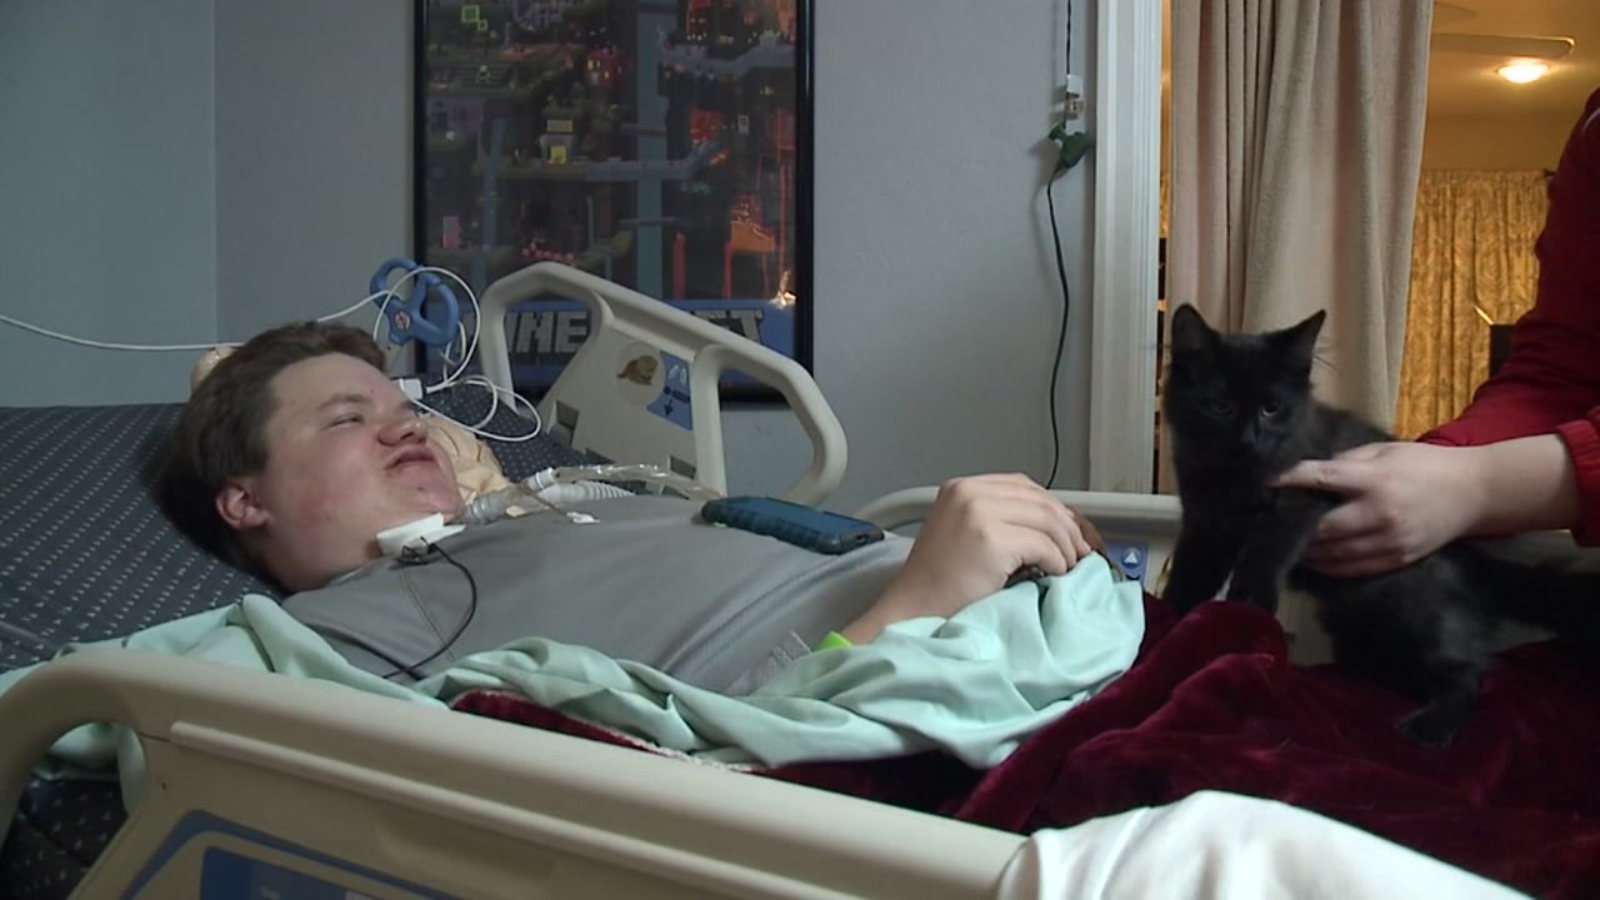 Mystery children's illness diagnosed - ABC13 Houston